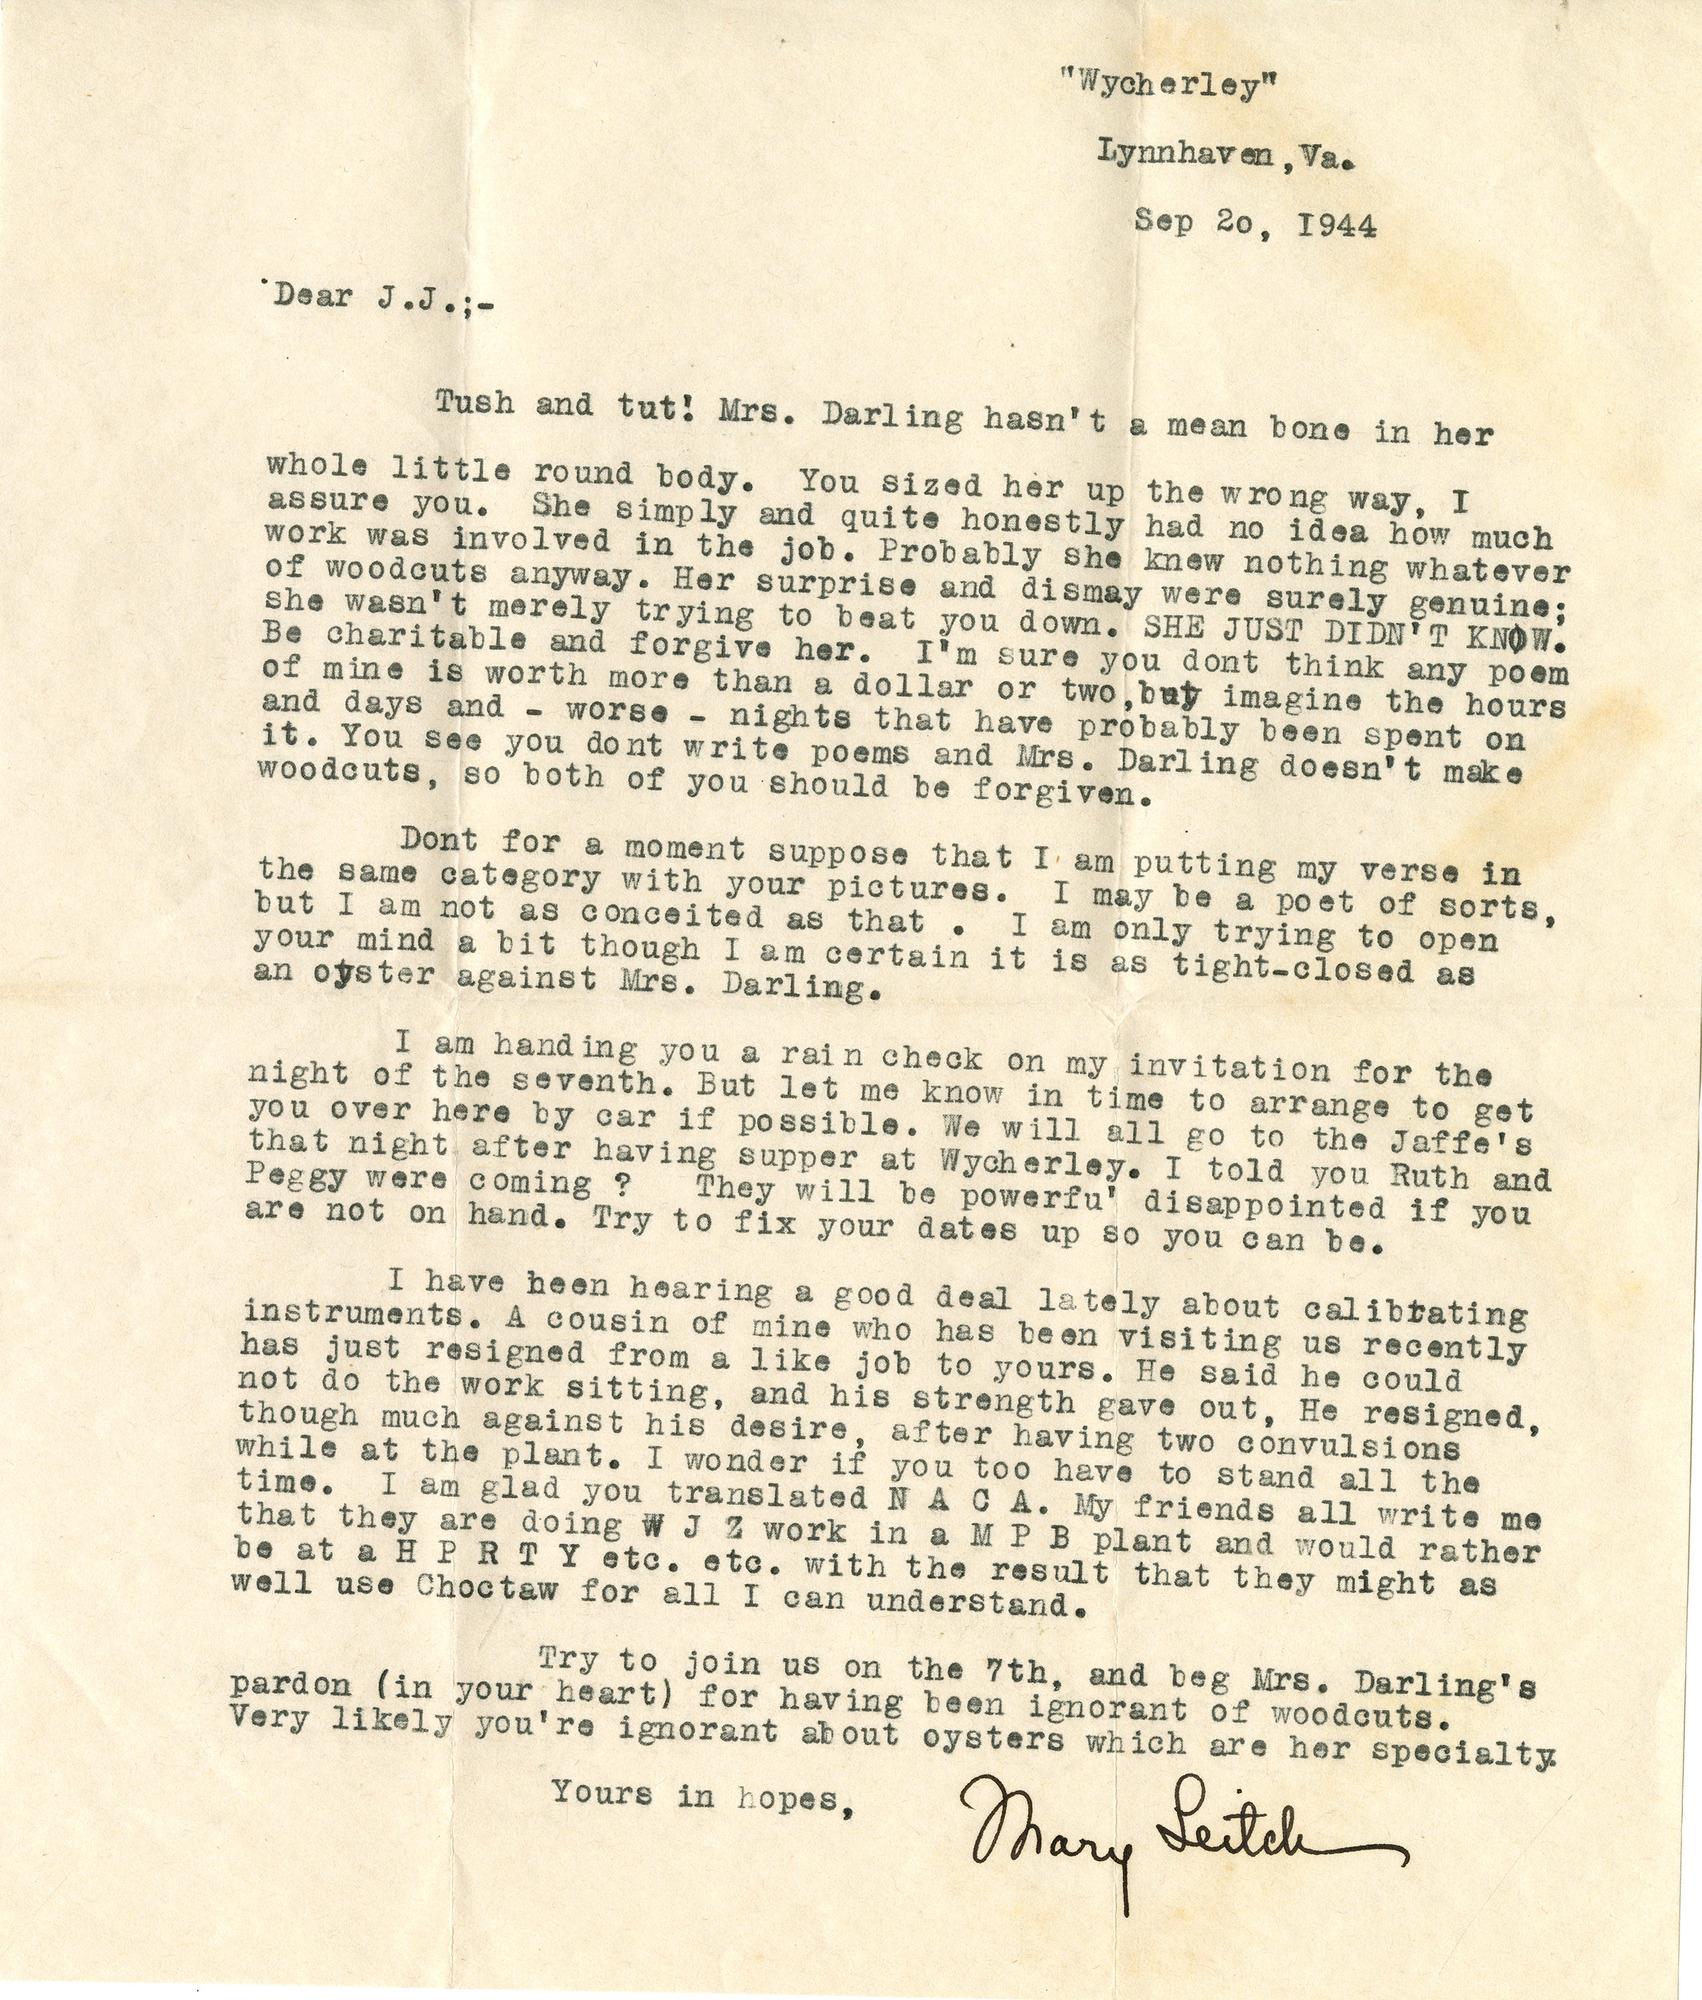 Letter, Mary Sinton Leitch to J. J. Lankes, September 20, 1944 (Ms2017-001)